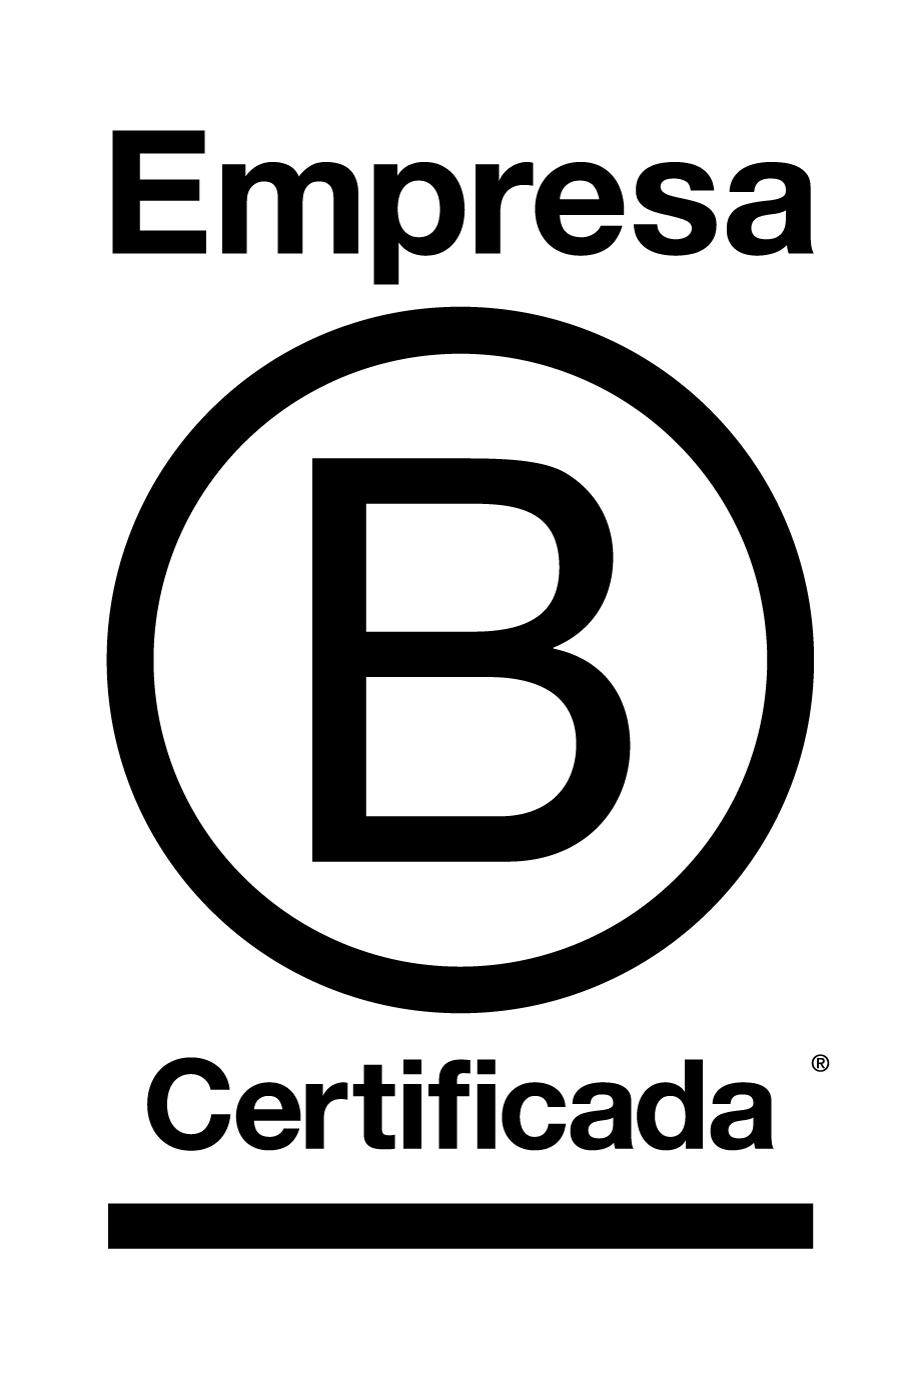 Empresa Certificada B